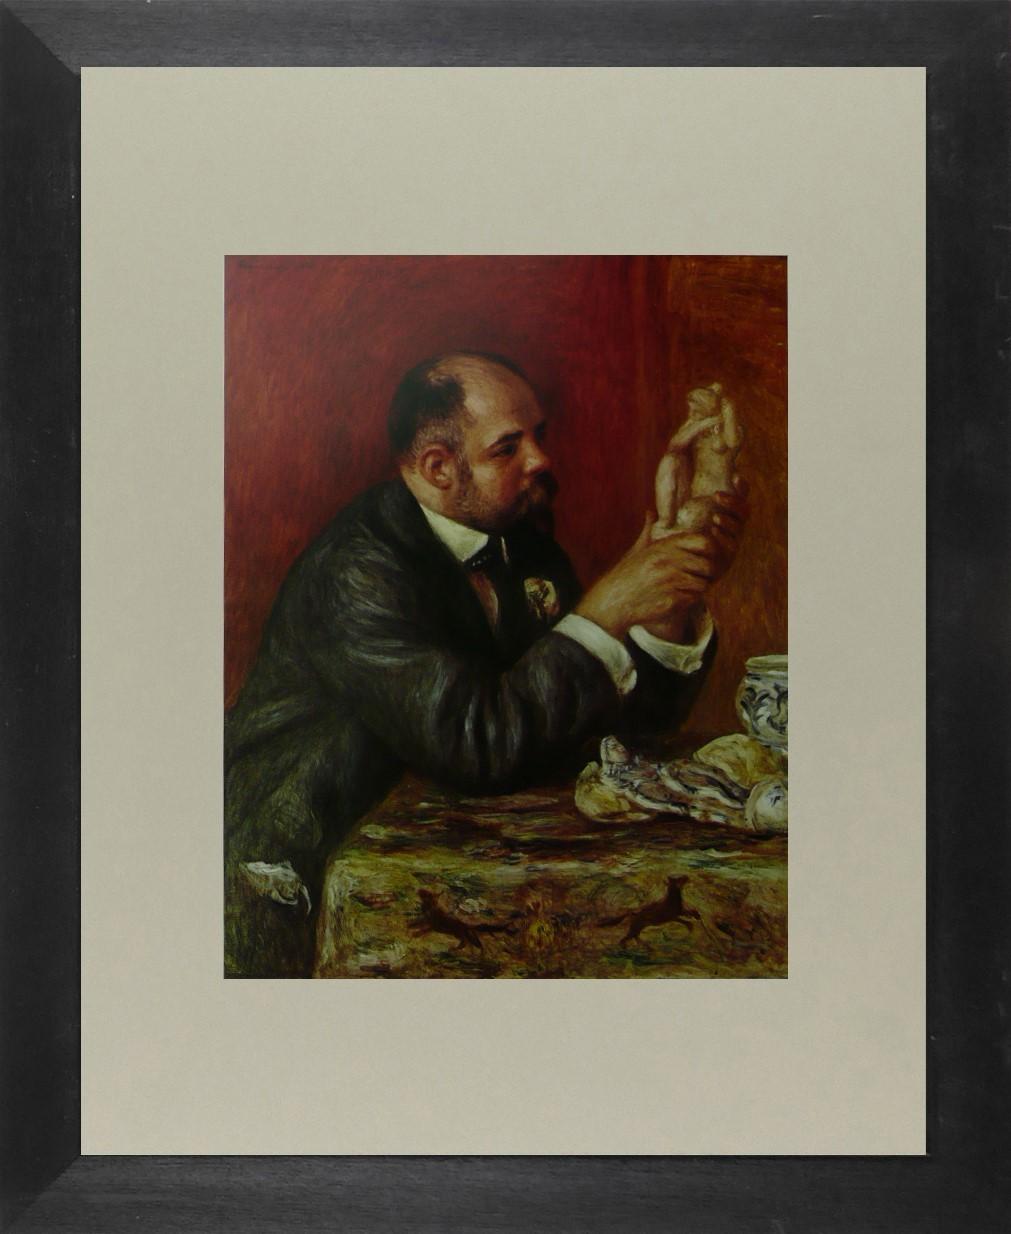 Portait of Ambroise Volland - Renoir - Framed Picture 11 x 14